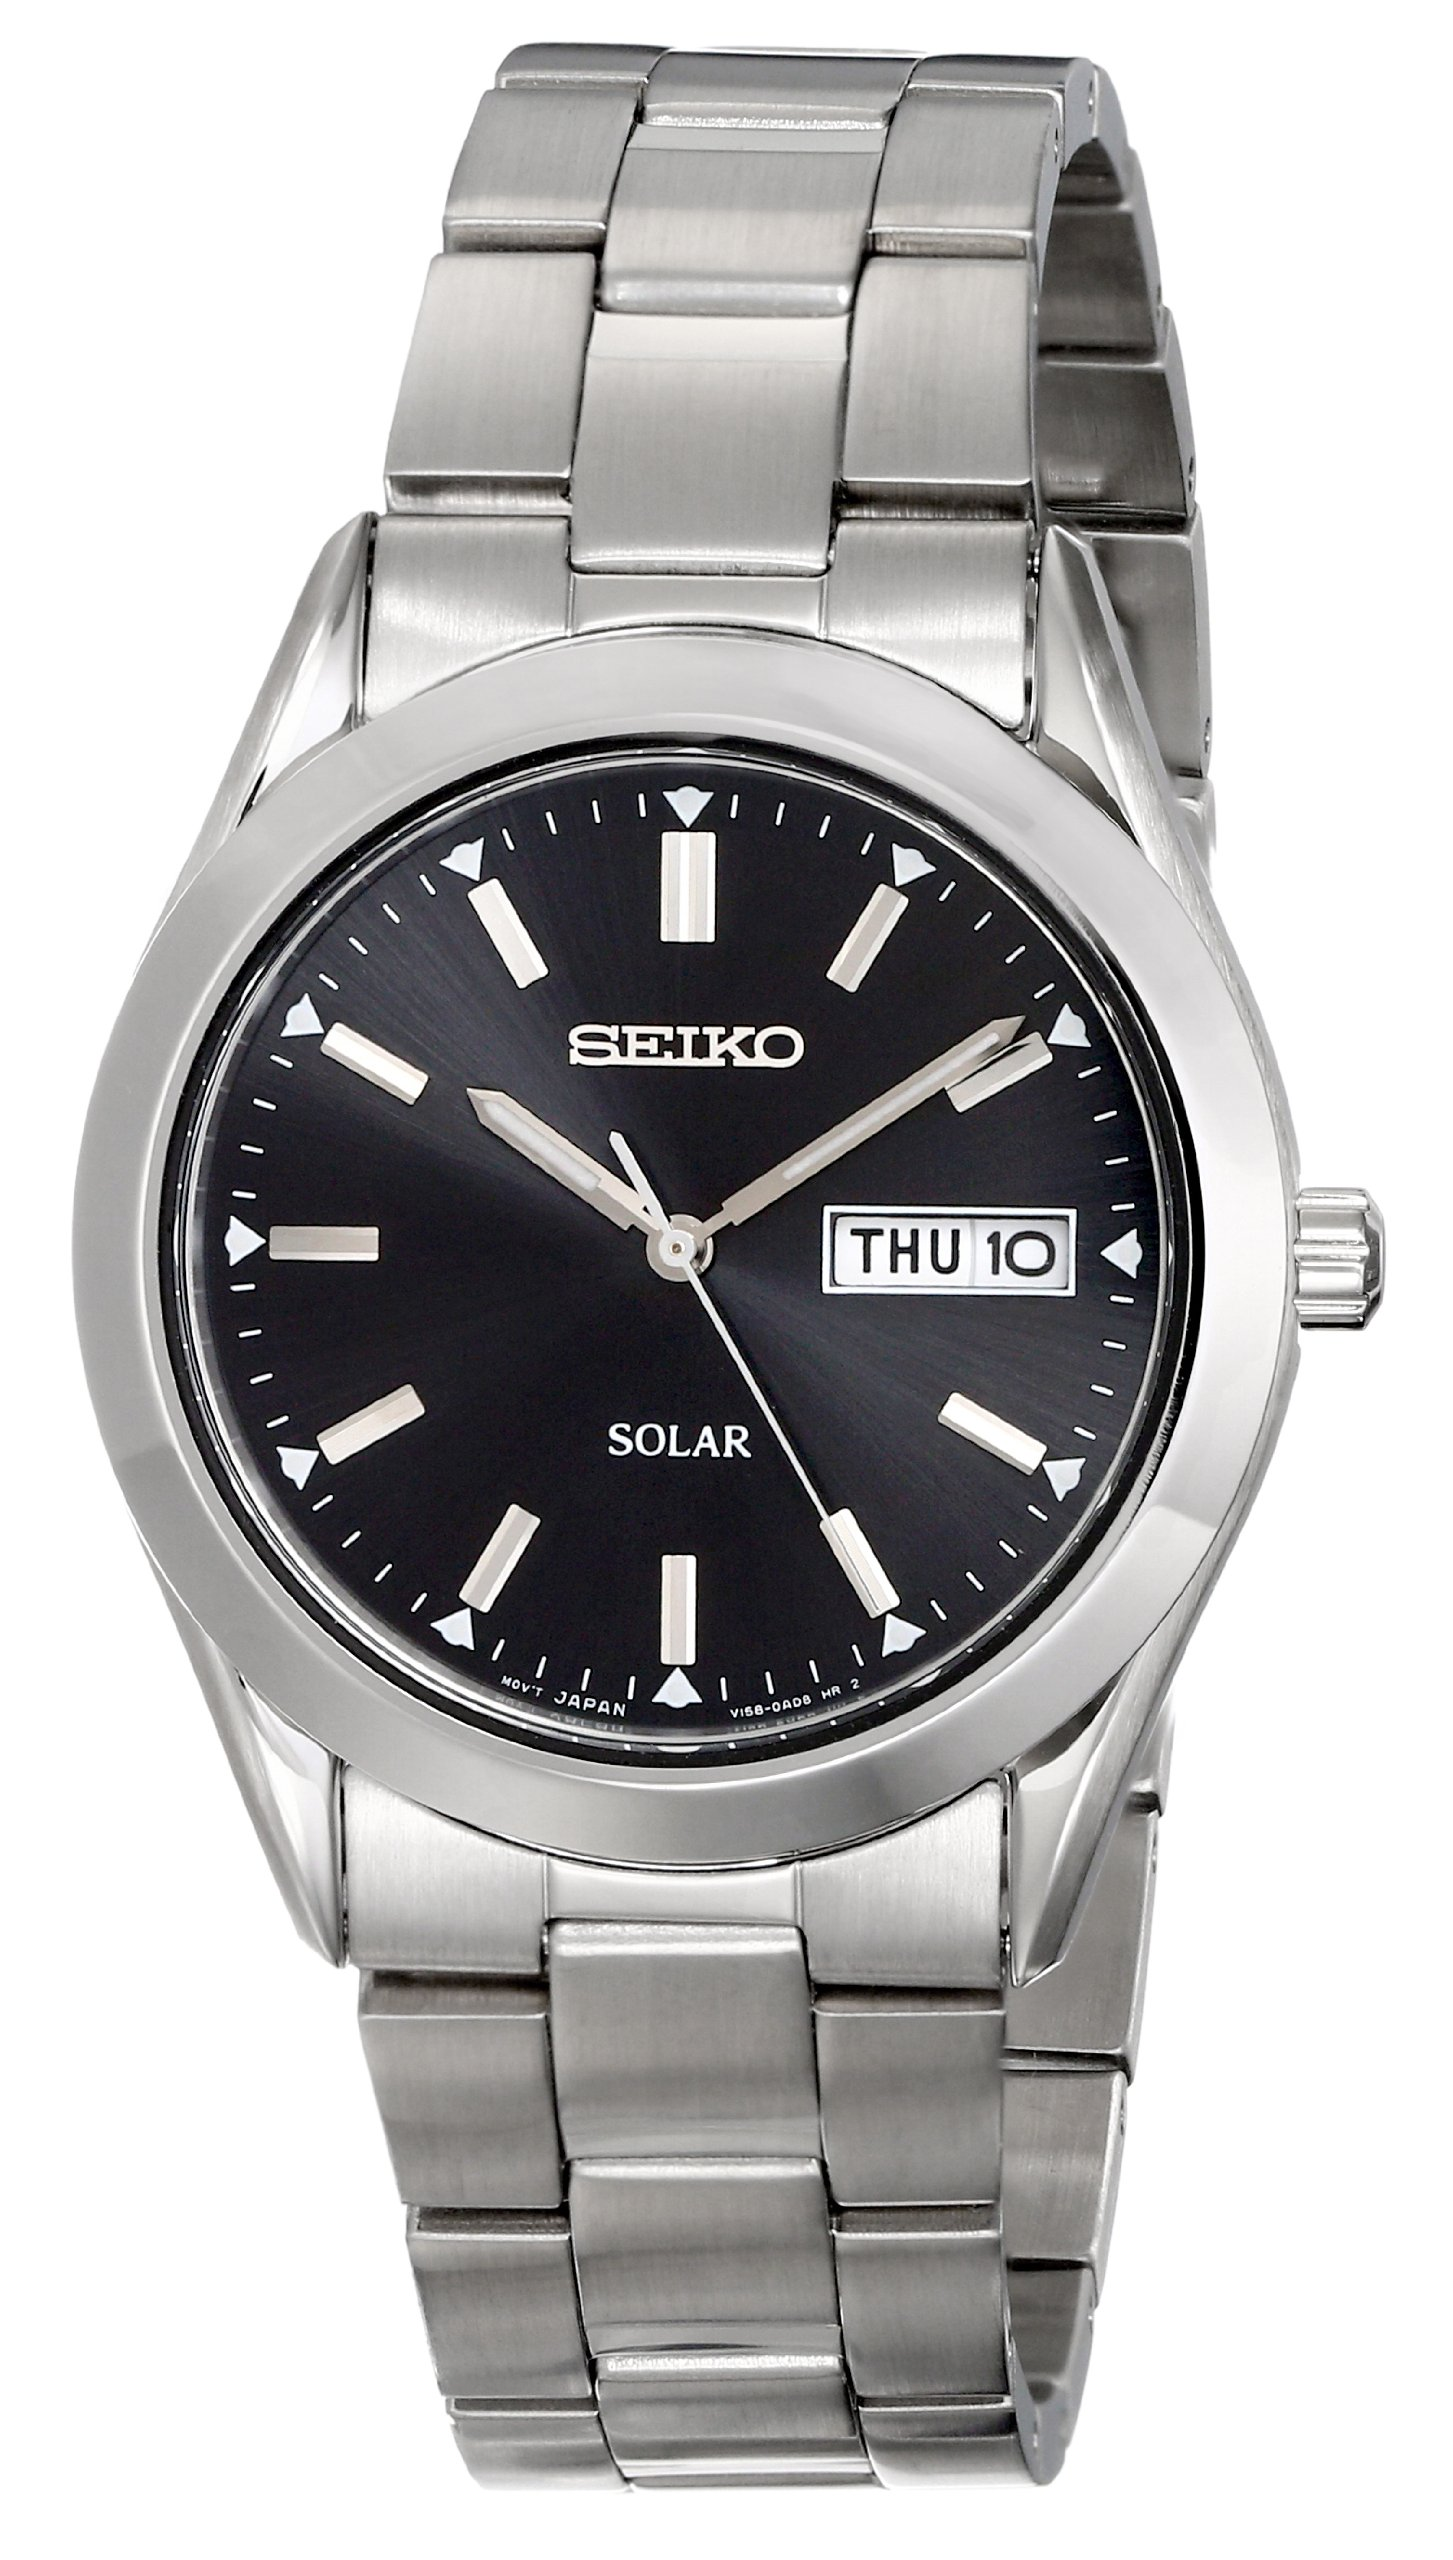 Seiko Men's SNE039 Stainless Steel Solar Watch